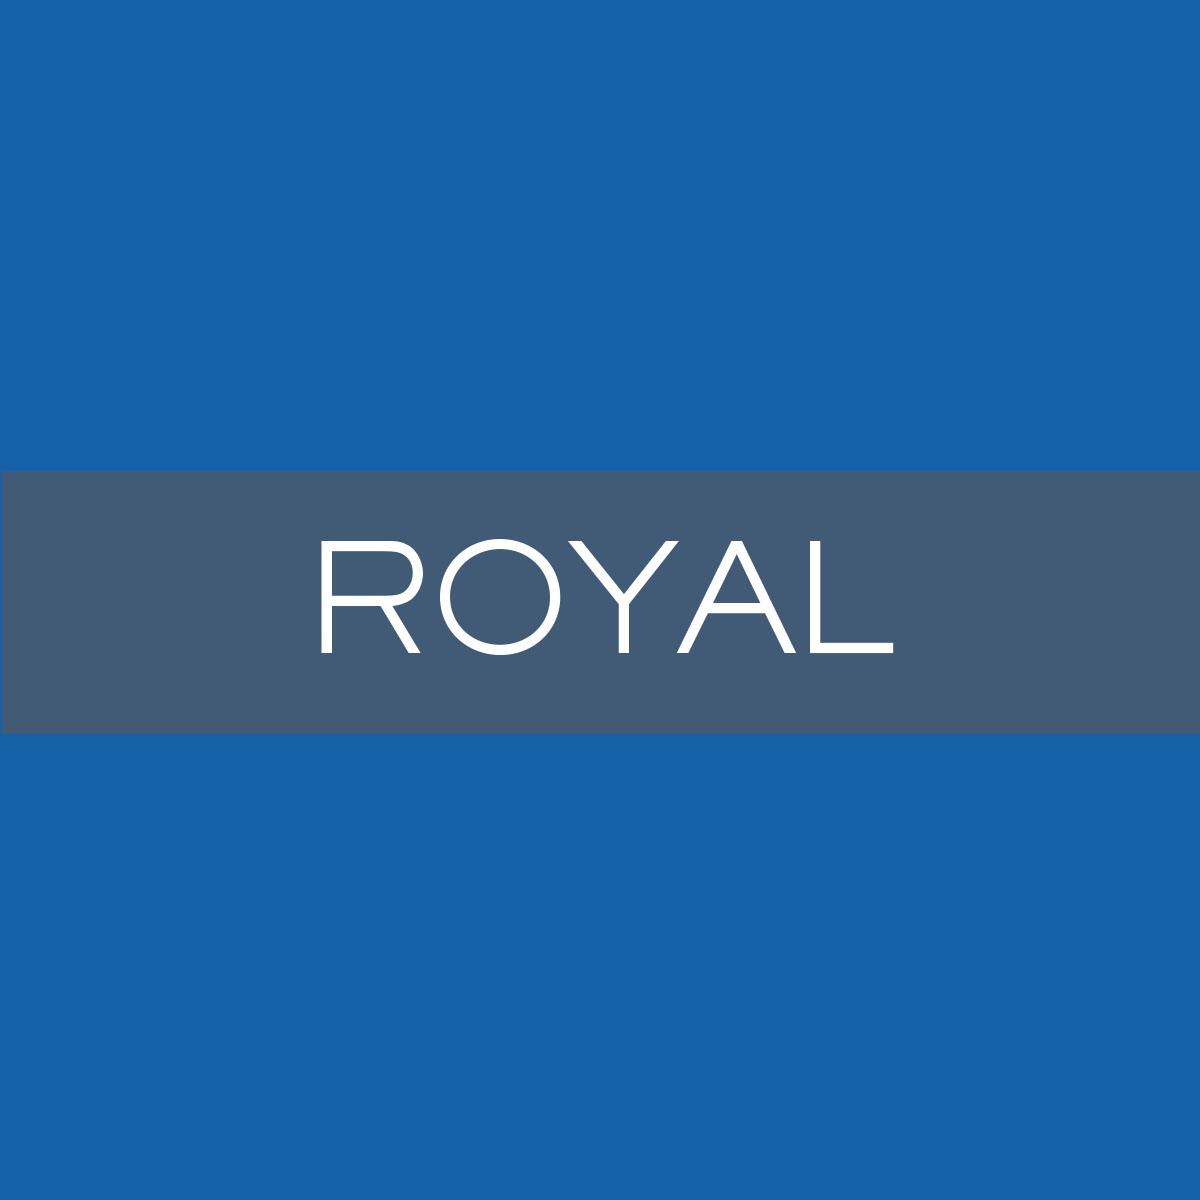 WNP_RoyalBlue.jpg